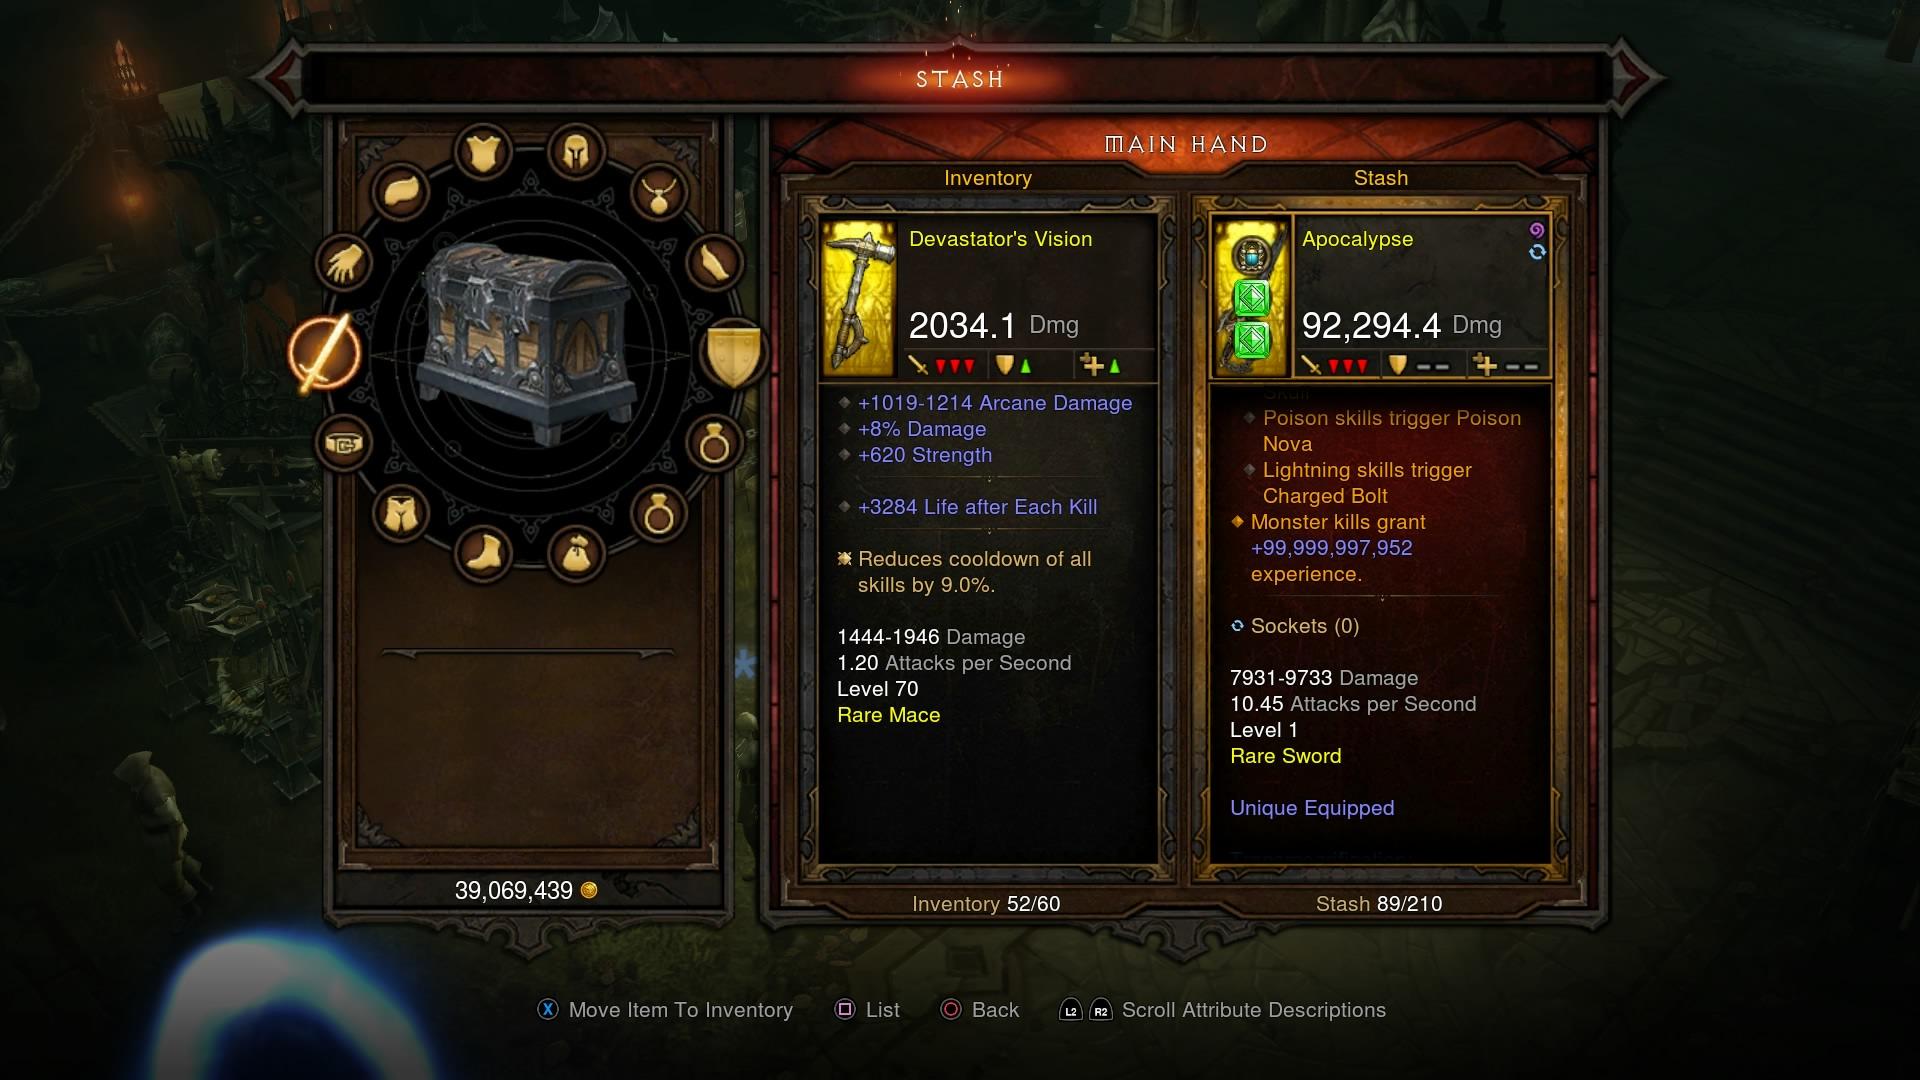 Diablo 3 Modded gear for DCUO trade or something else you offer